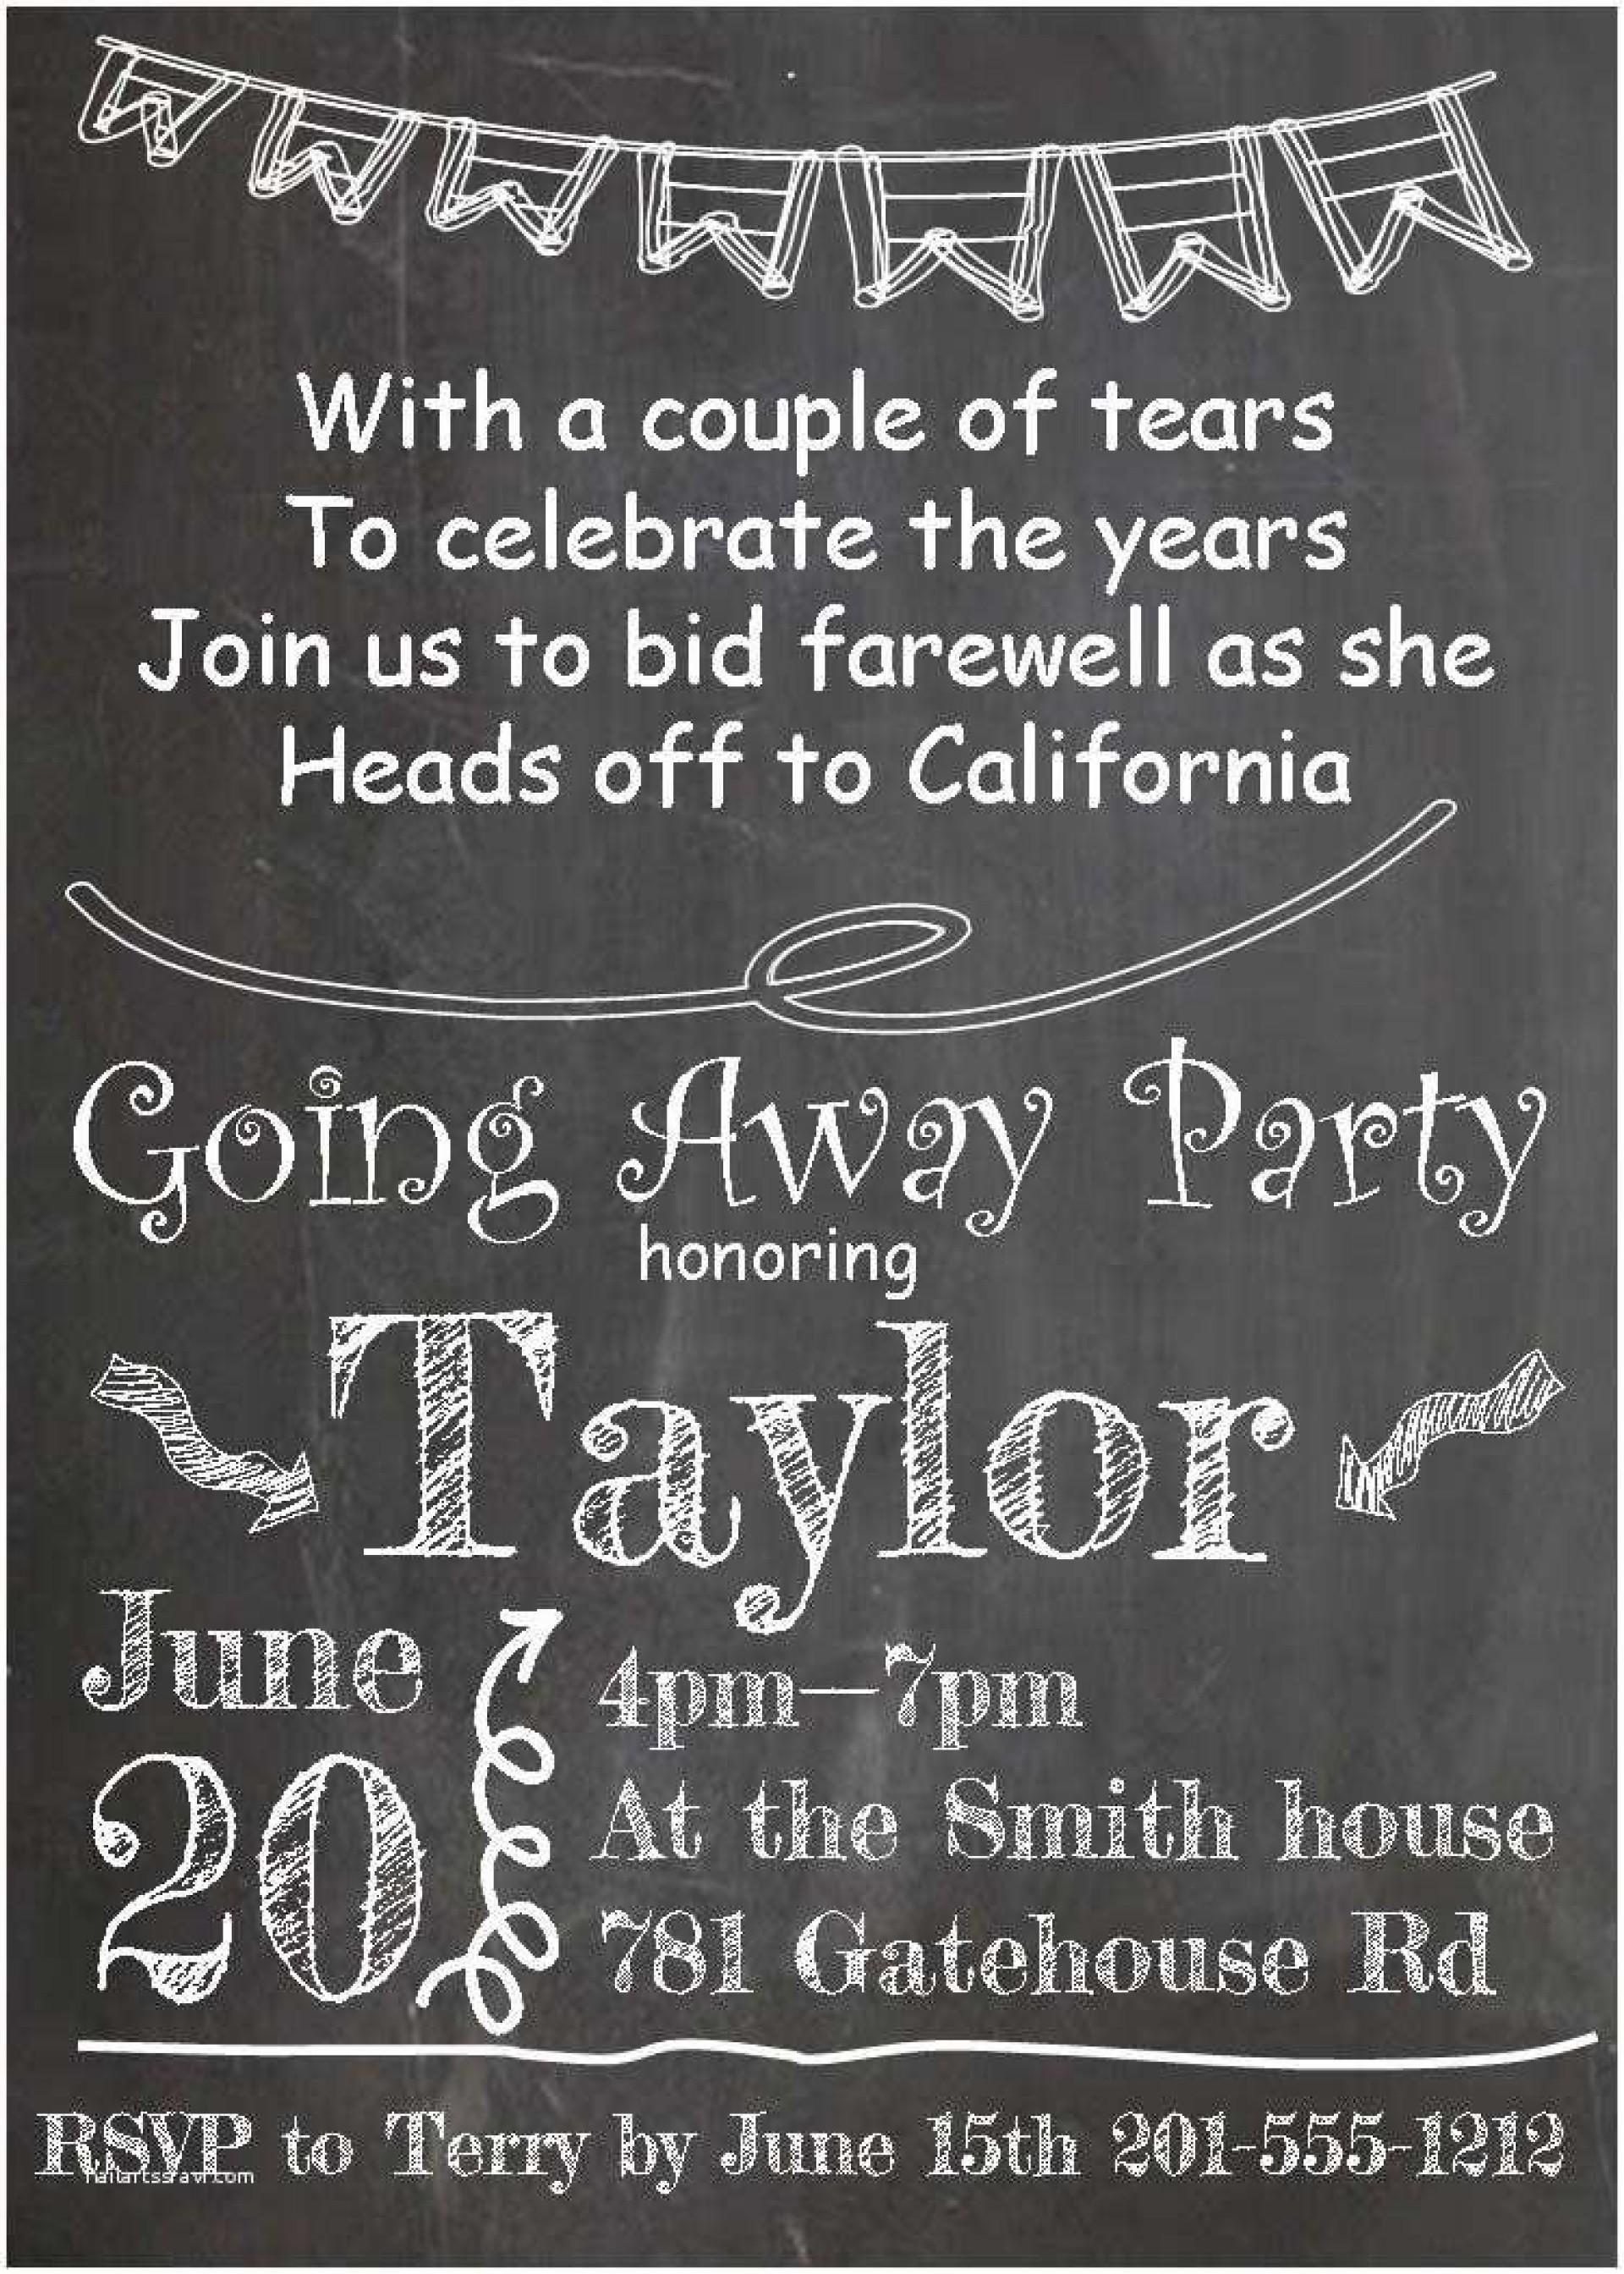 008 Wondrou Farewell Party Invitation Template Free Design  Email Printable Word1920